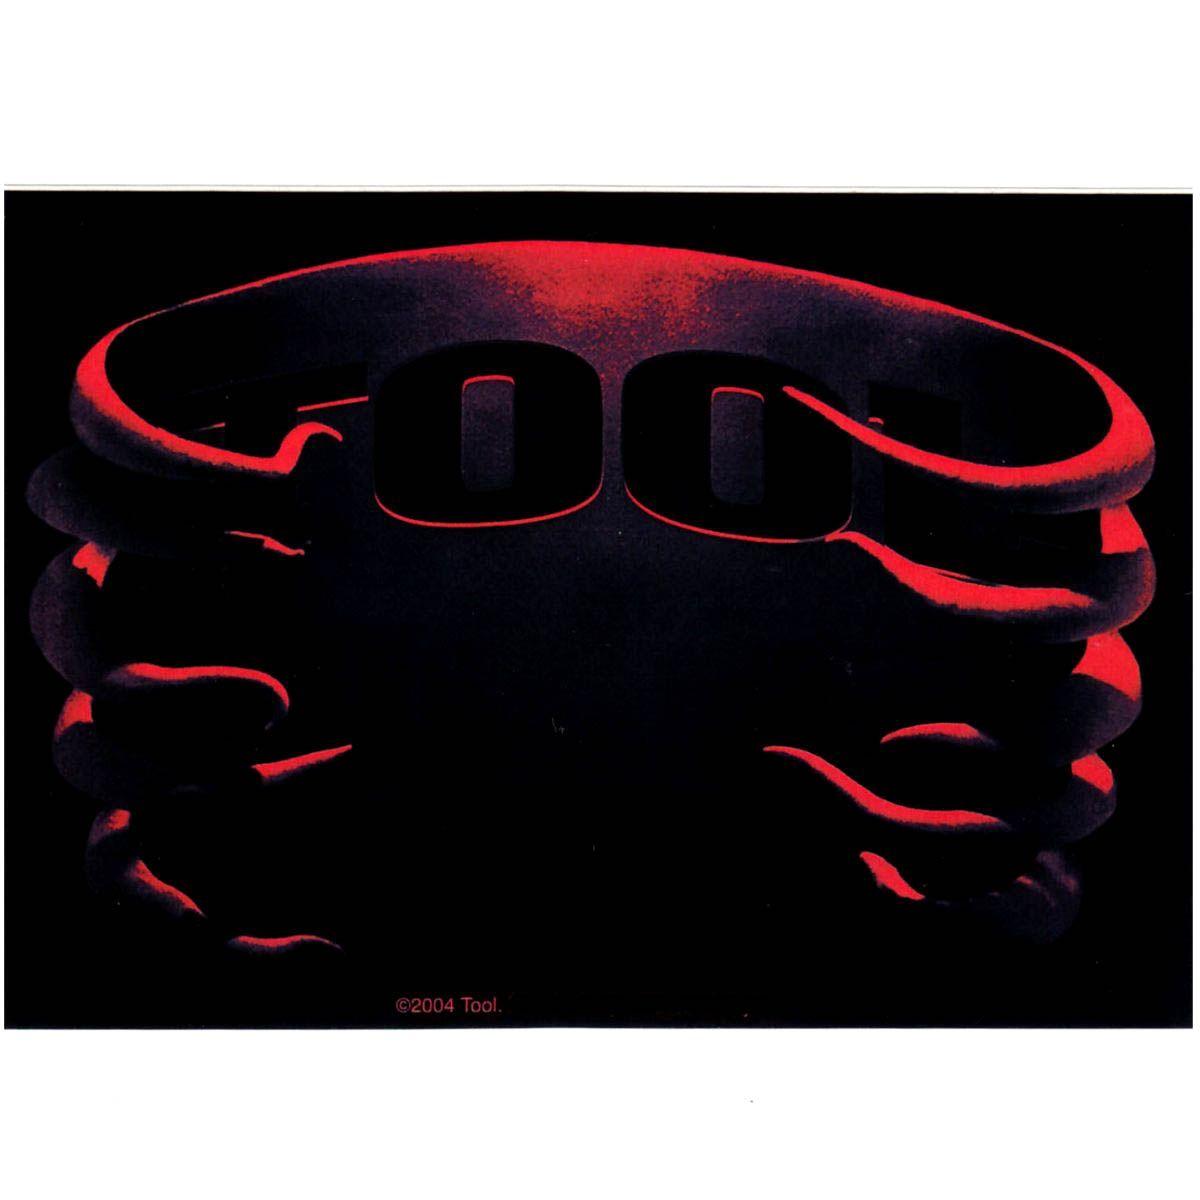 Tool Undertow Sticker Metal Music Bands Heavy Metal Music Stickers [ 1200 x 1200 Pixel ]